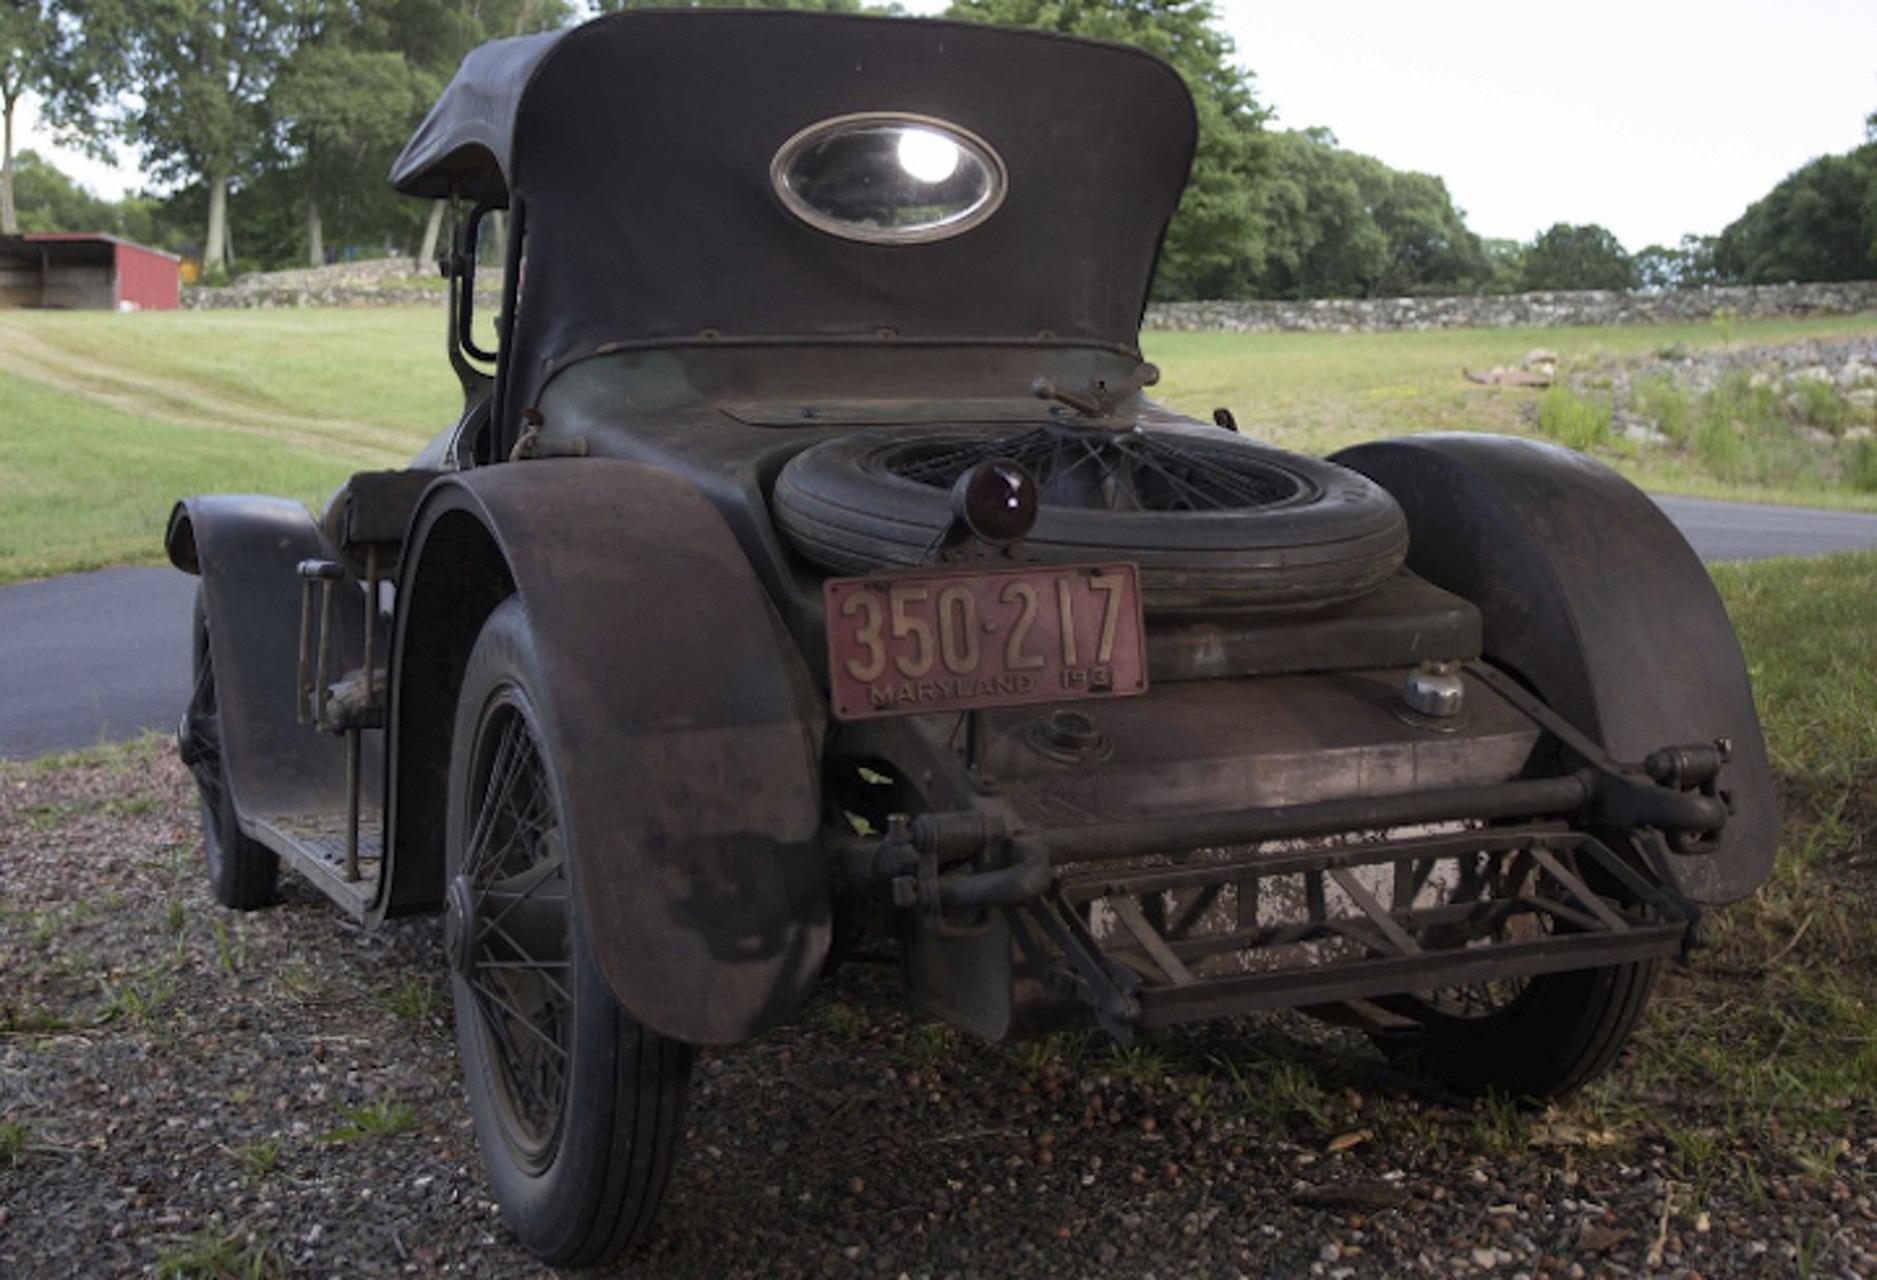 1921 Stutz Bearcat Headed to Auction With Plenty of Patina